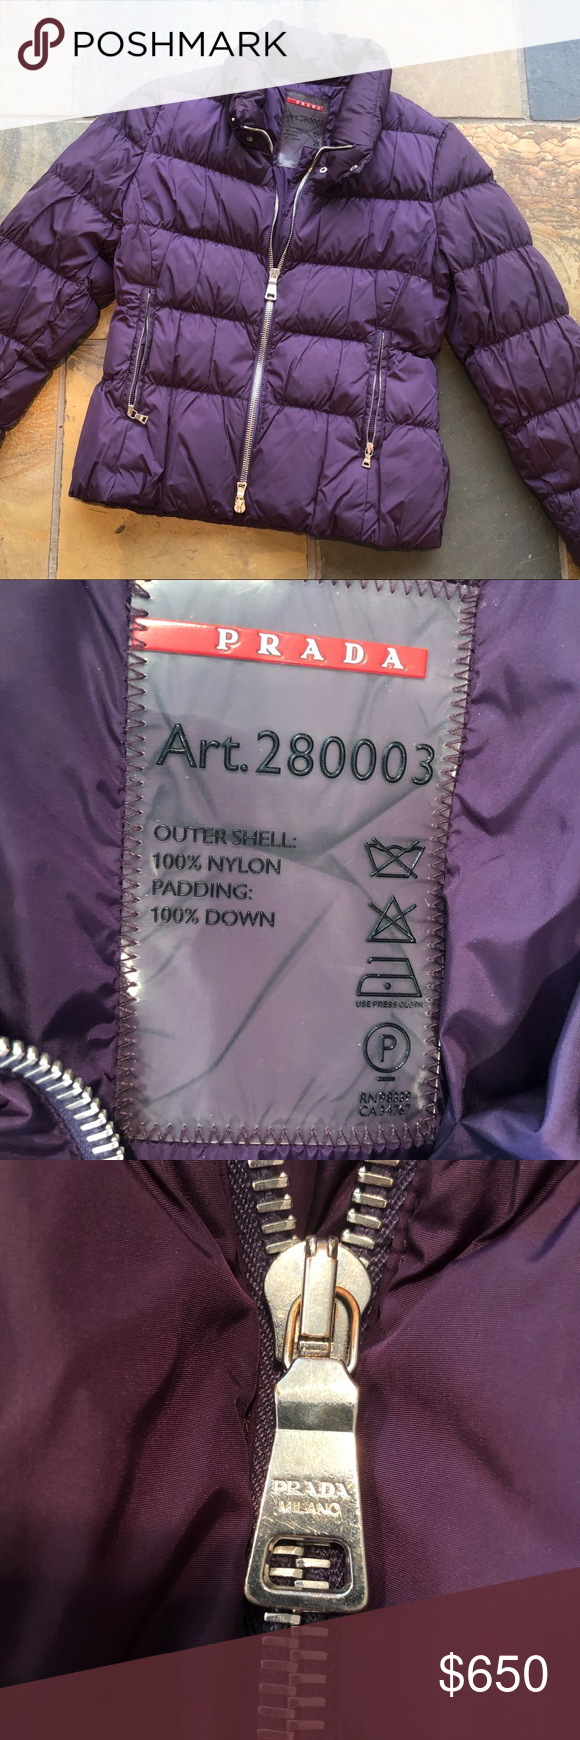 Prada Puffer Purple Prada Puffer Jacket With Silver Zippers And Buttons In Perfect Condition Super Cute And Warm Prada Jackets Prada Prada Art Prada Jacket [ 1740 x 580 Pixel ]